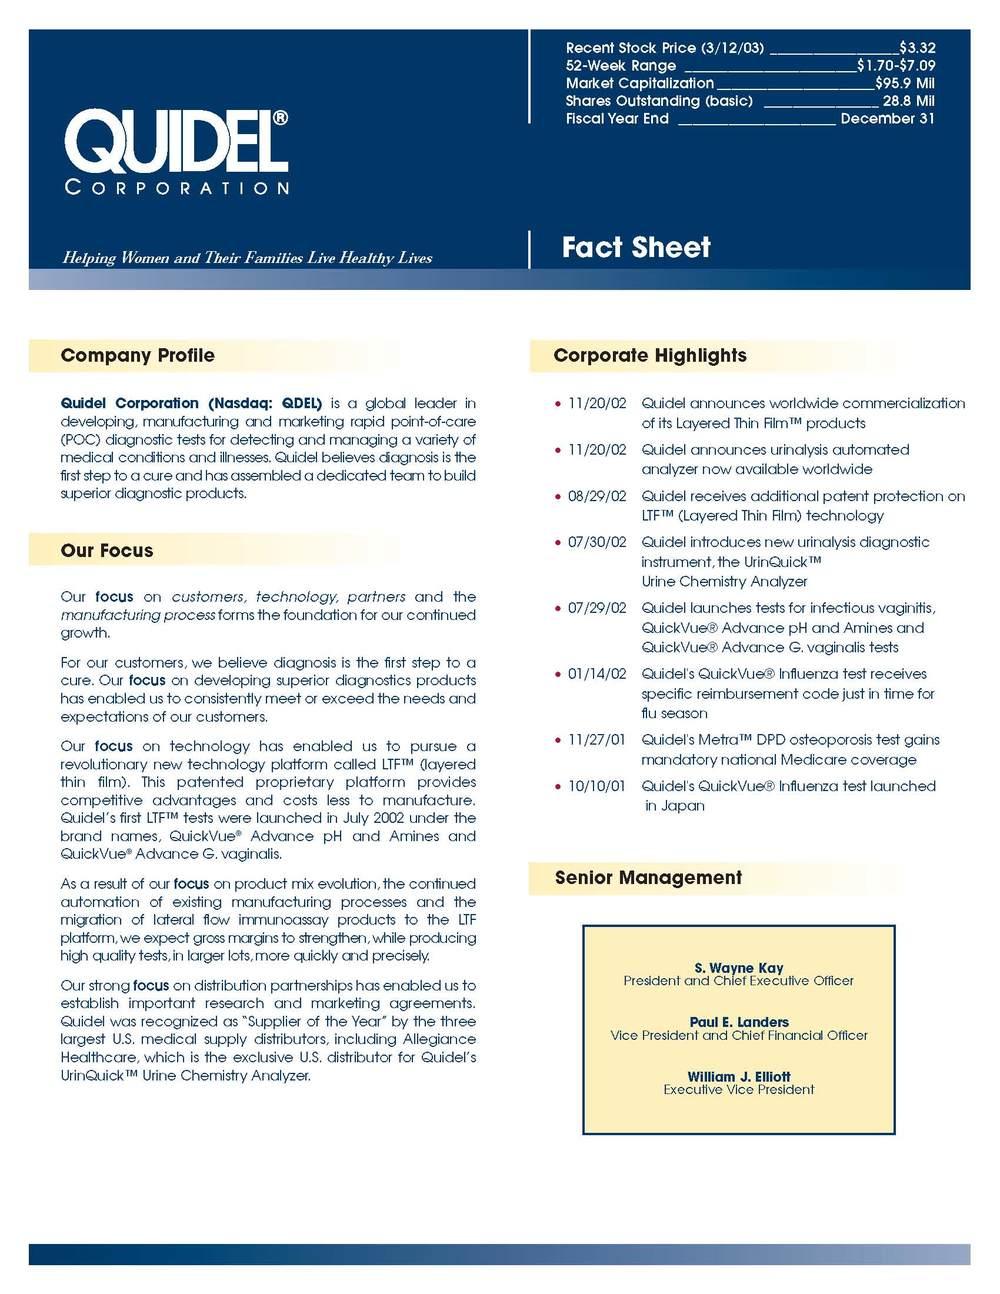 QUI-130 FactSheet 3.13.03_Page_1.jpg